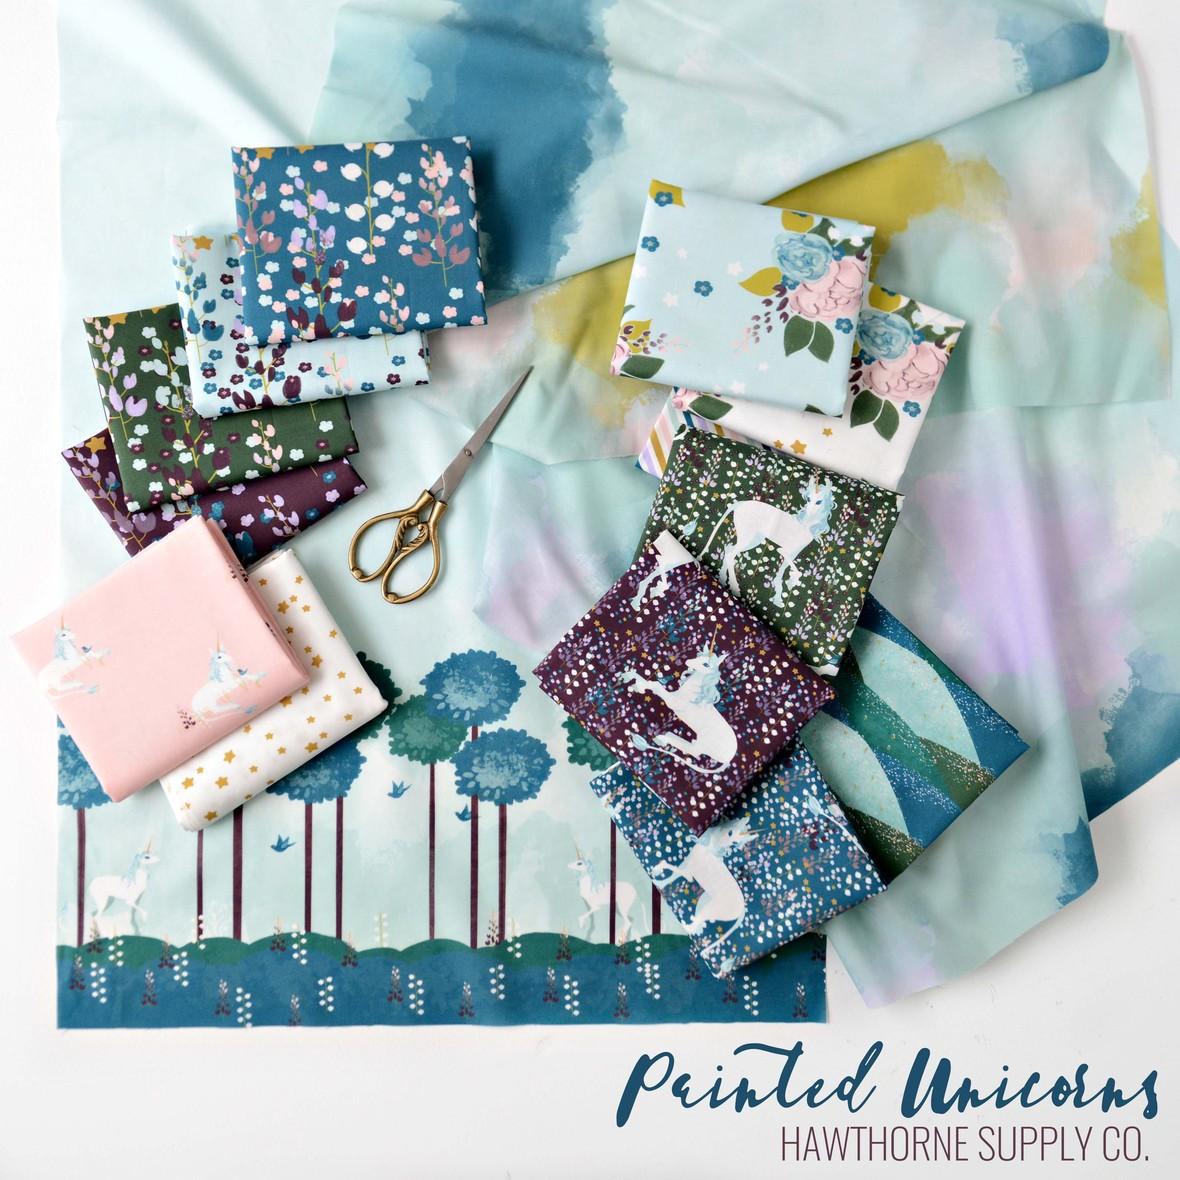 Painted Unicorns Fabric Poster Hawthorne Supply Co